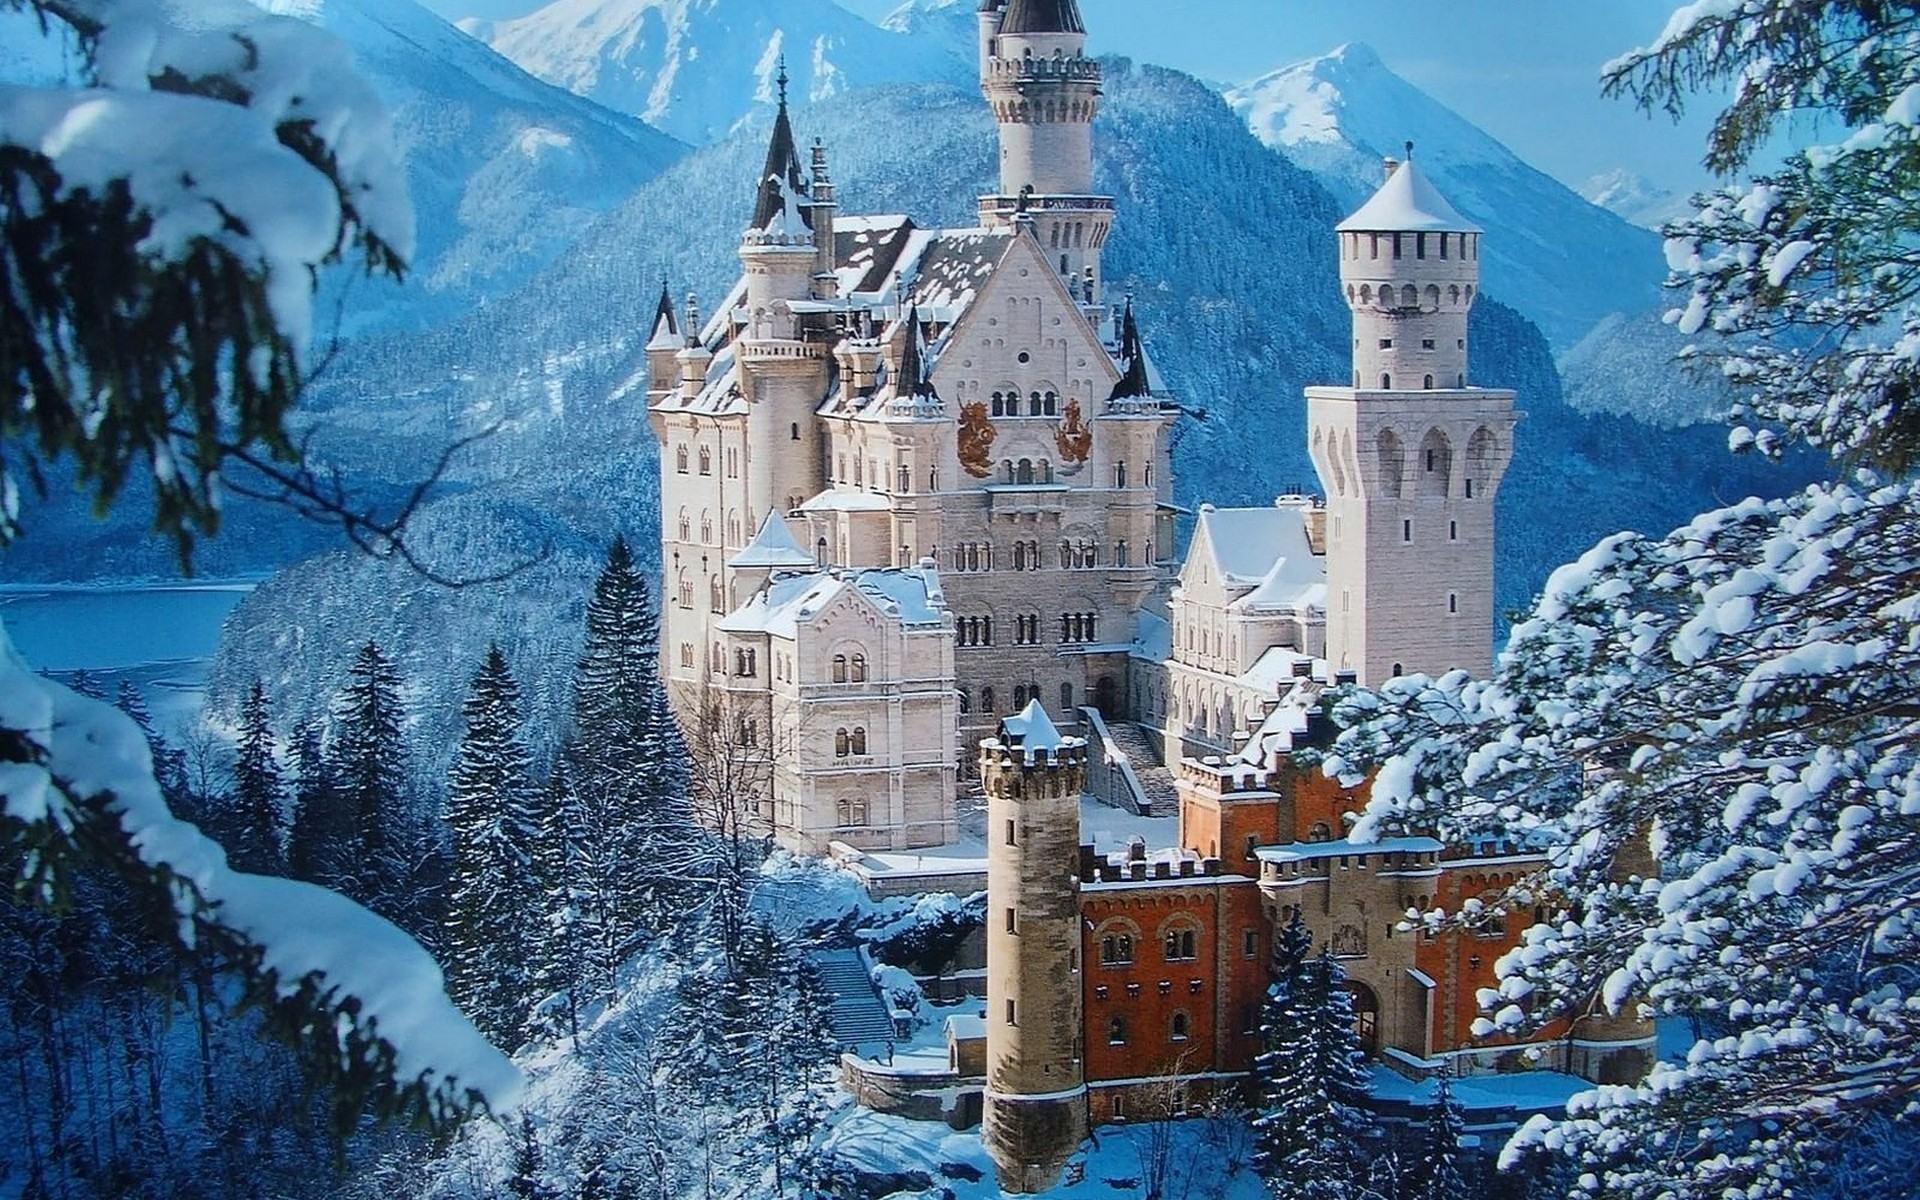 winter desktop backgrounds (54+ images)